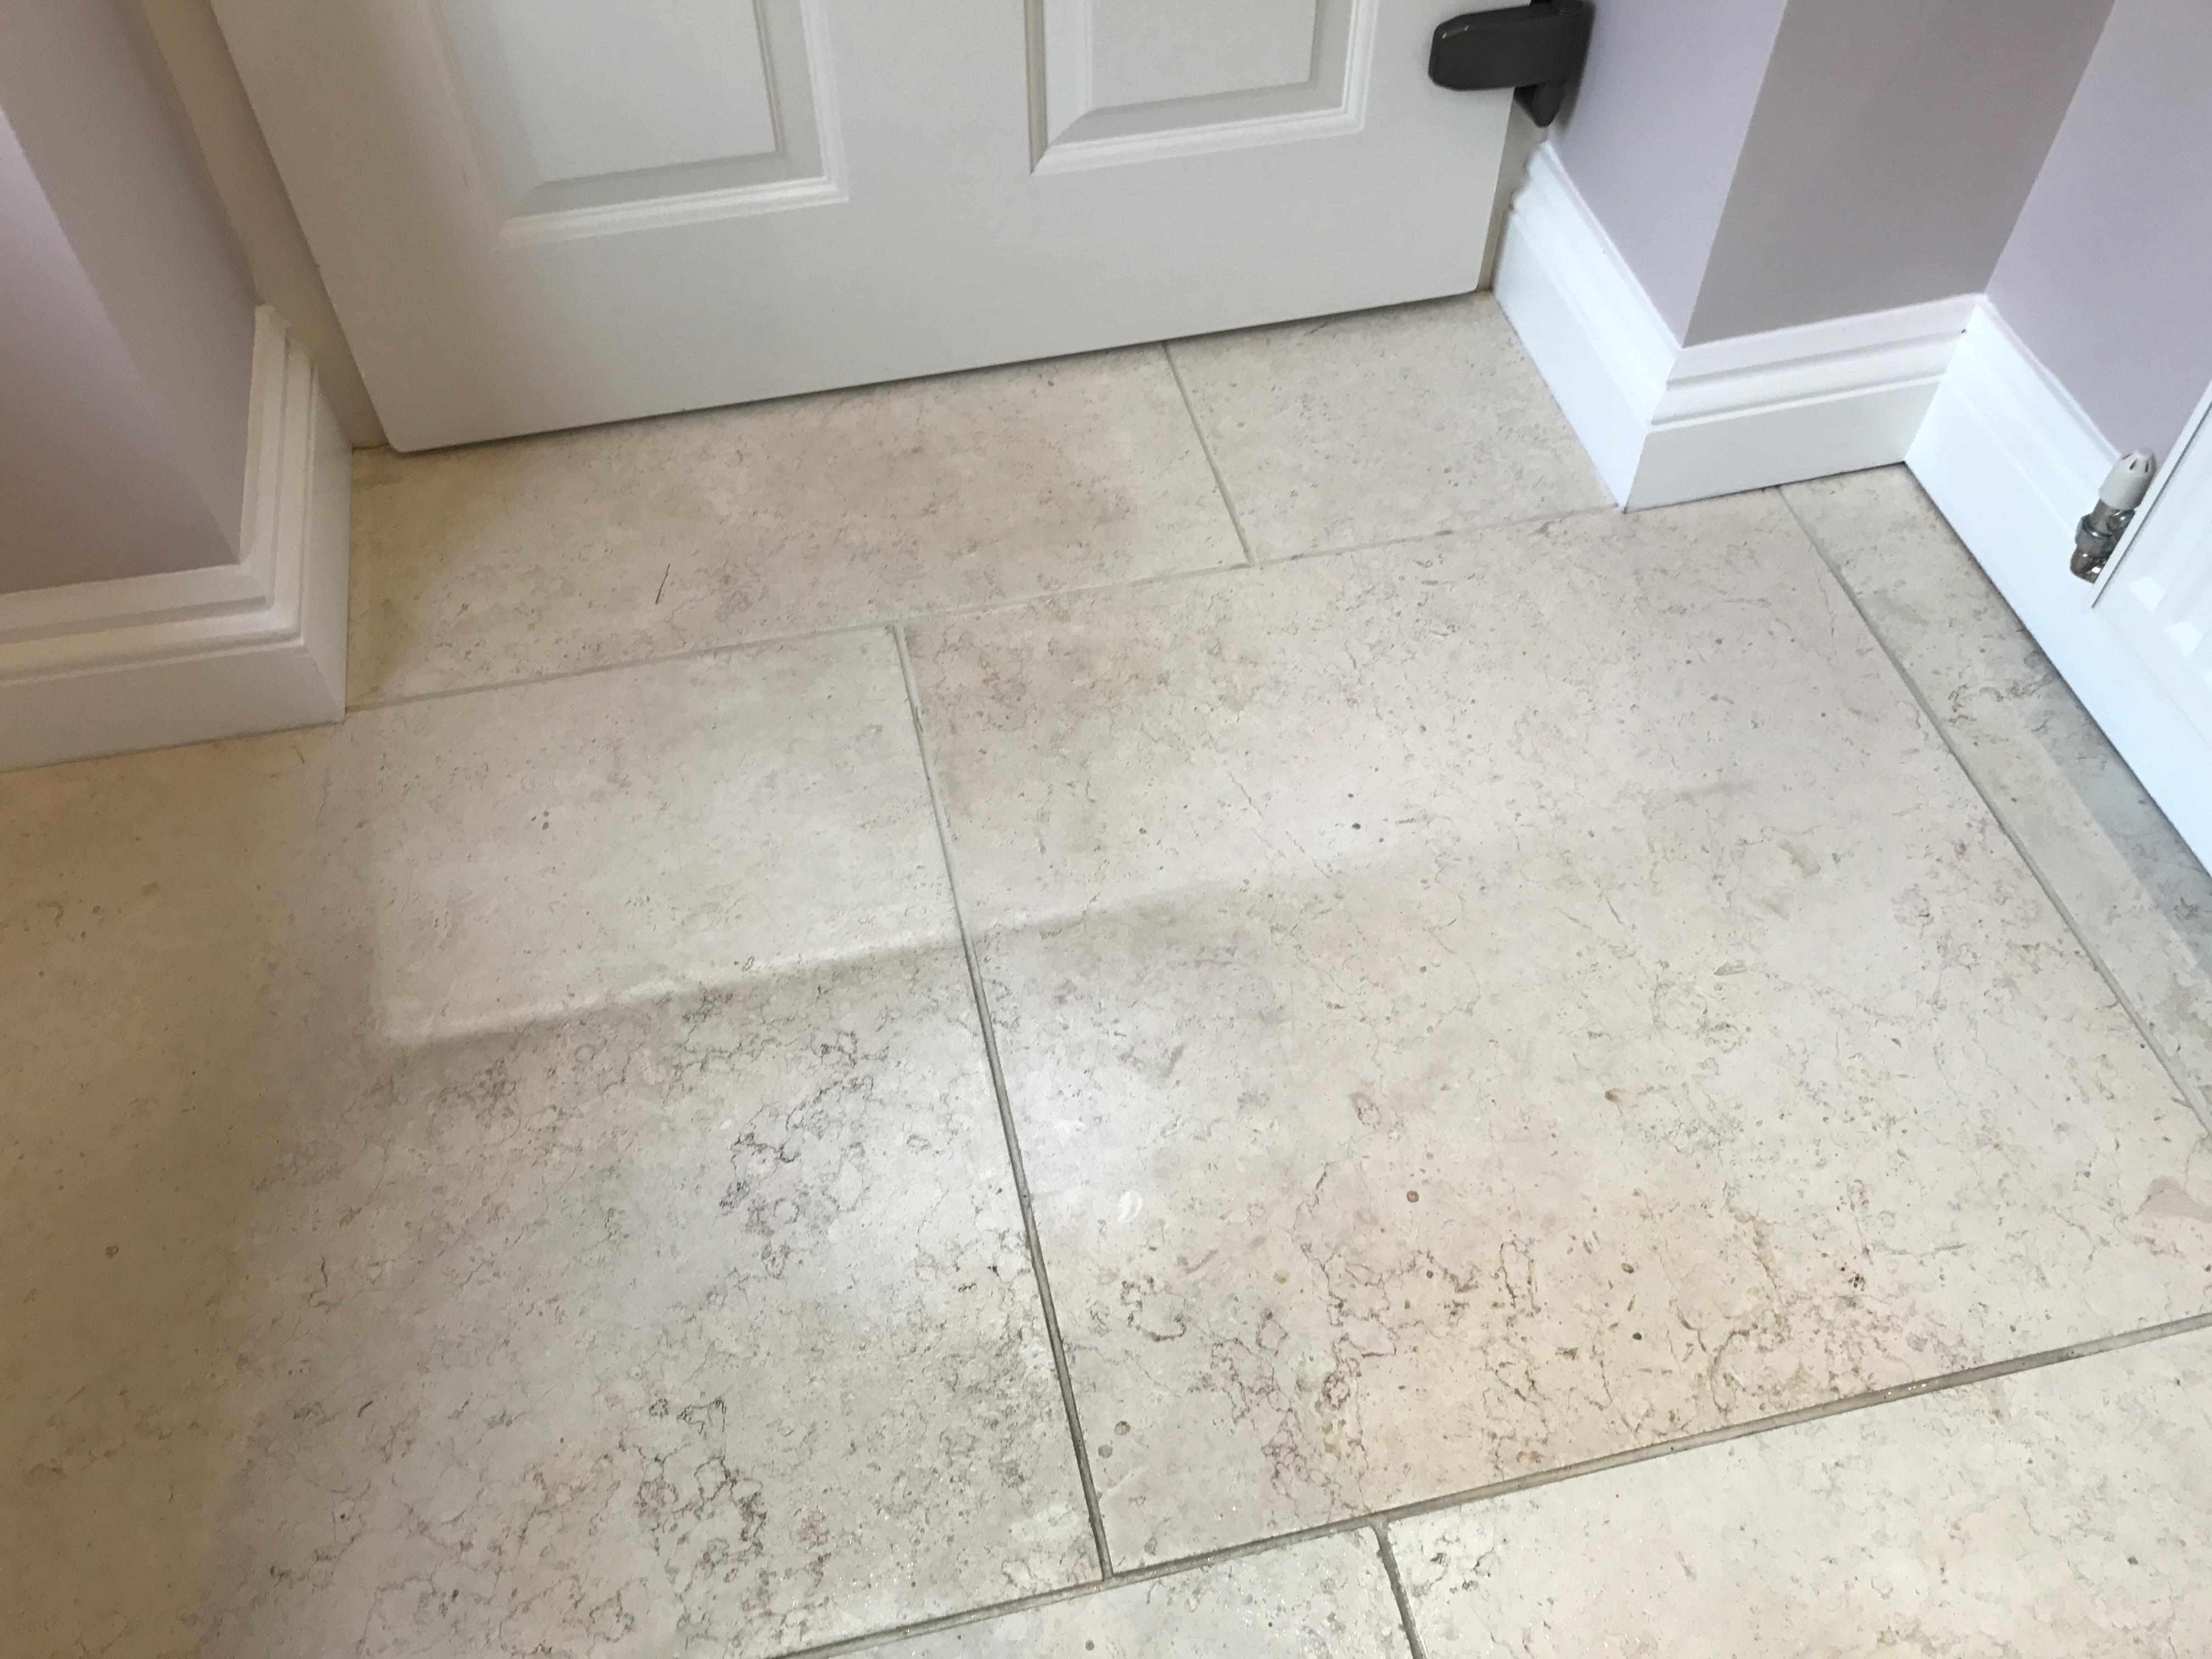 Carpet Cleaner Washington Houghton Le Spring Seaham Dry